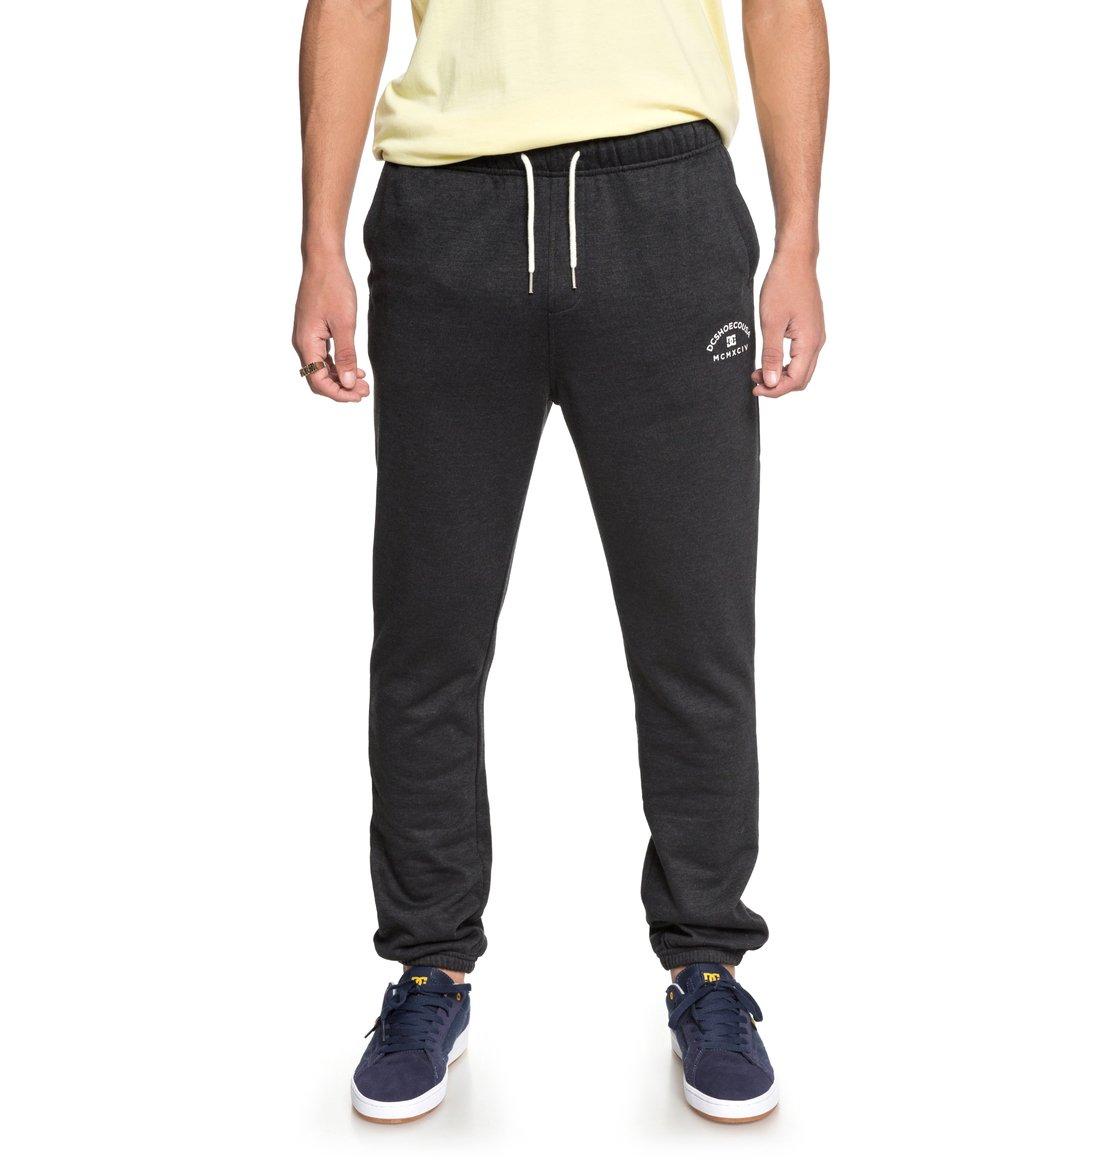 rebel pantalon de jogging pour homme 3613373430199 dc. Black Bedroom Furniture Sets. Home Design Ideas